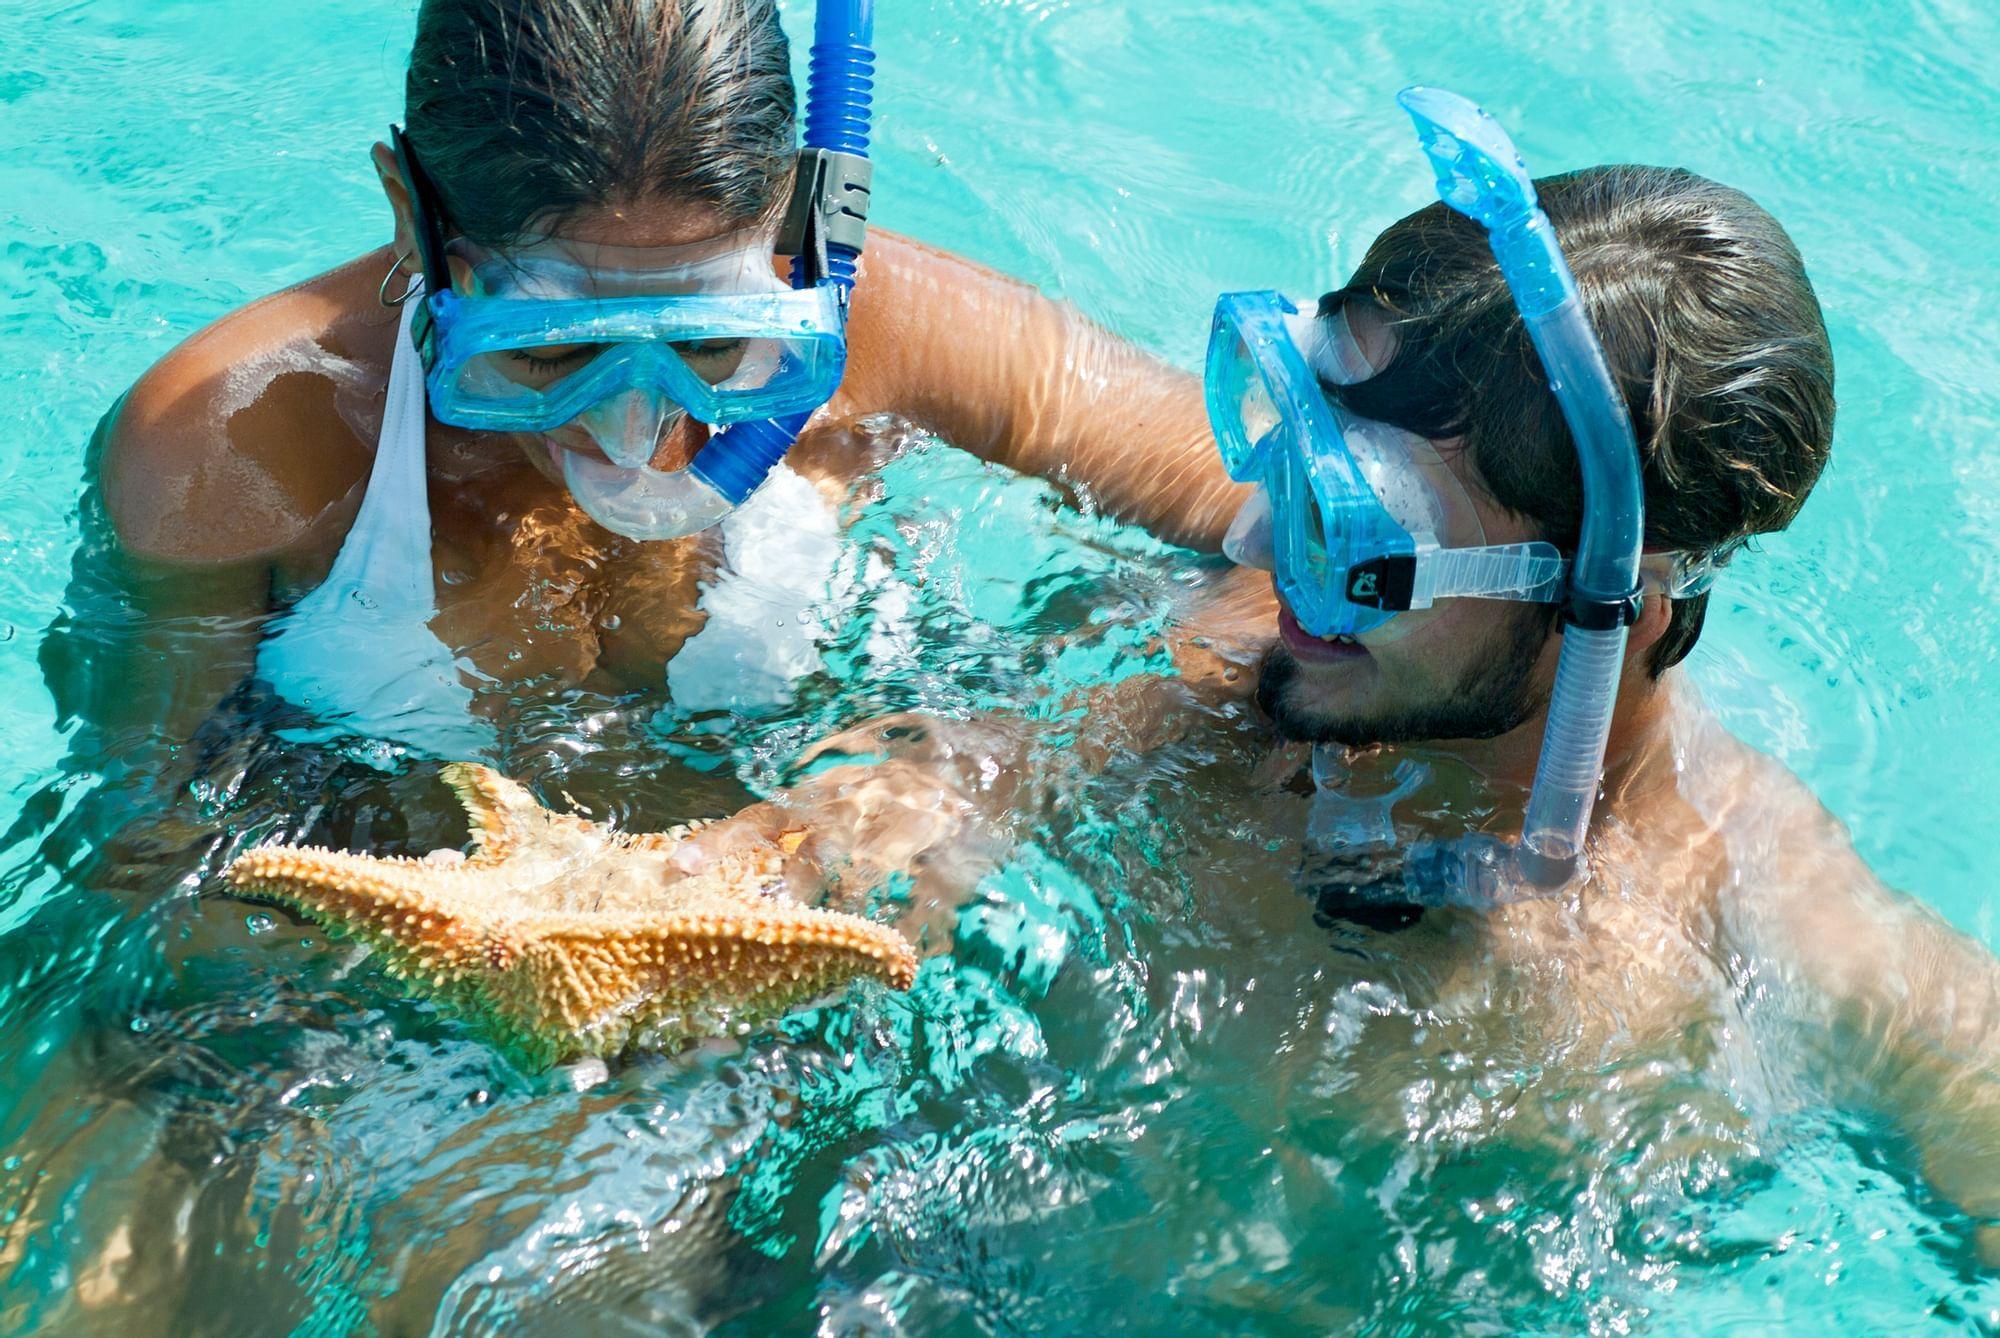 Pair of Buck Island Snorkelers with starfish